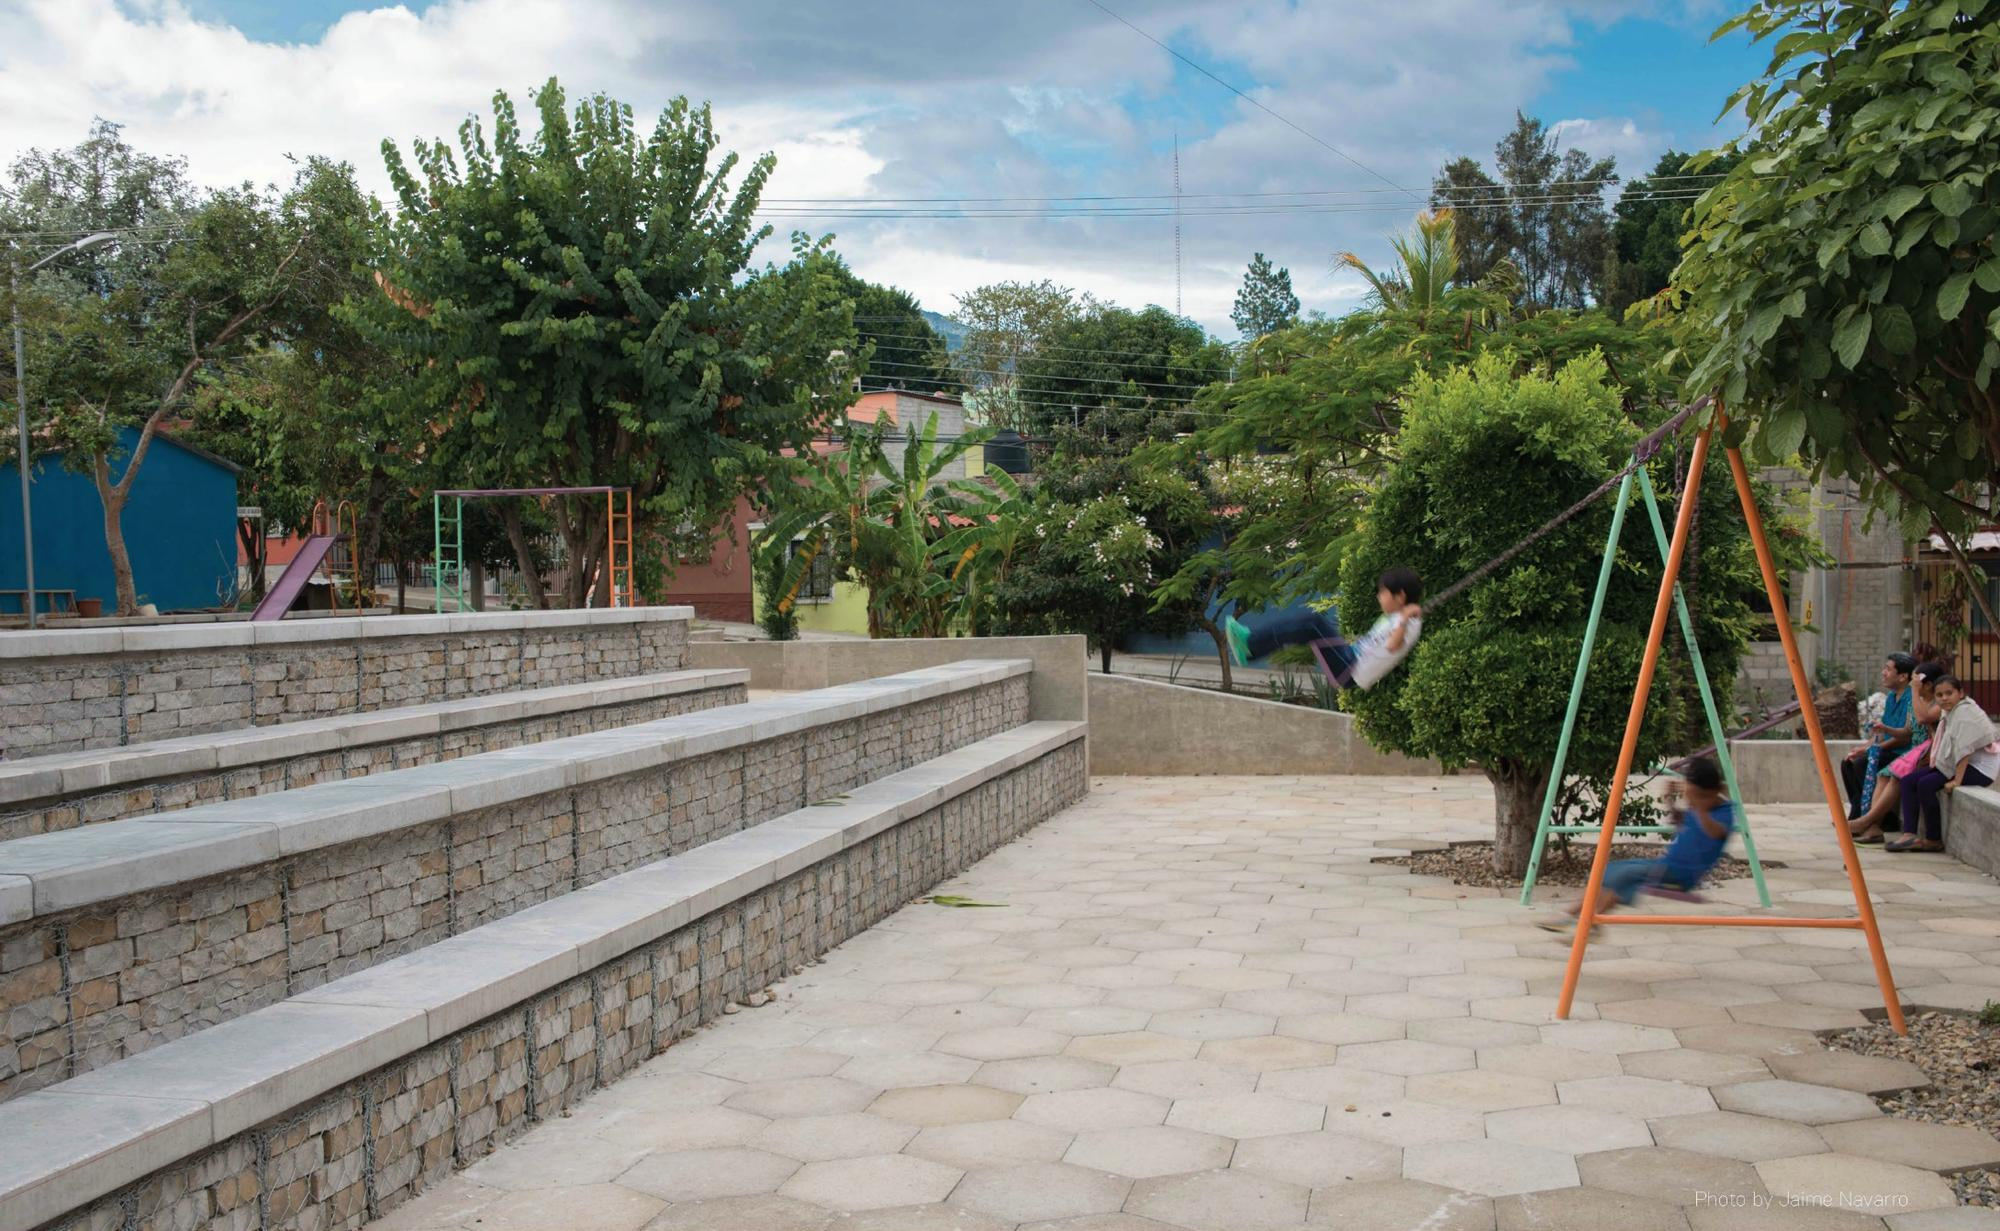 Cambridge office david rockefeller center - Gardening in prisons plants and social rehabilitation ...